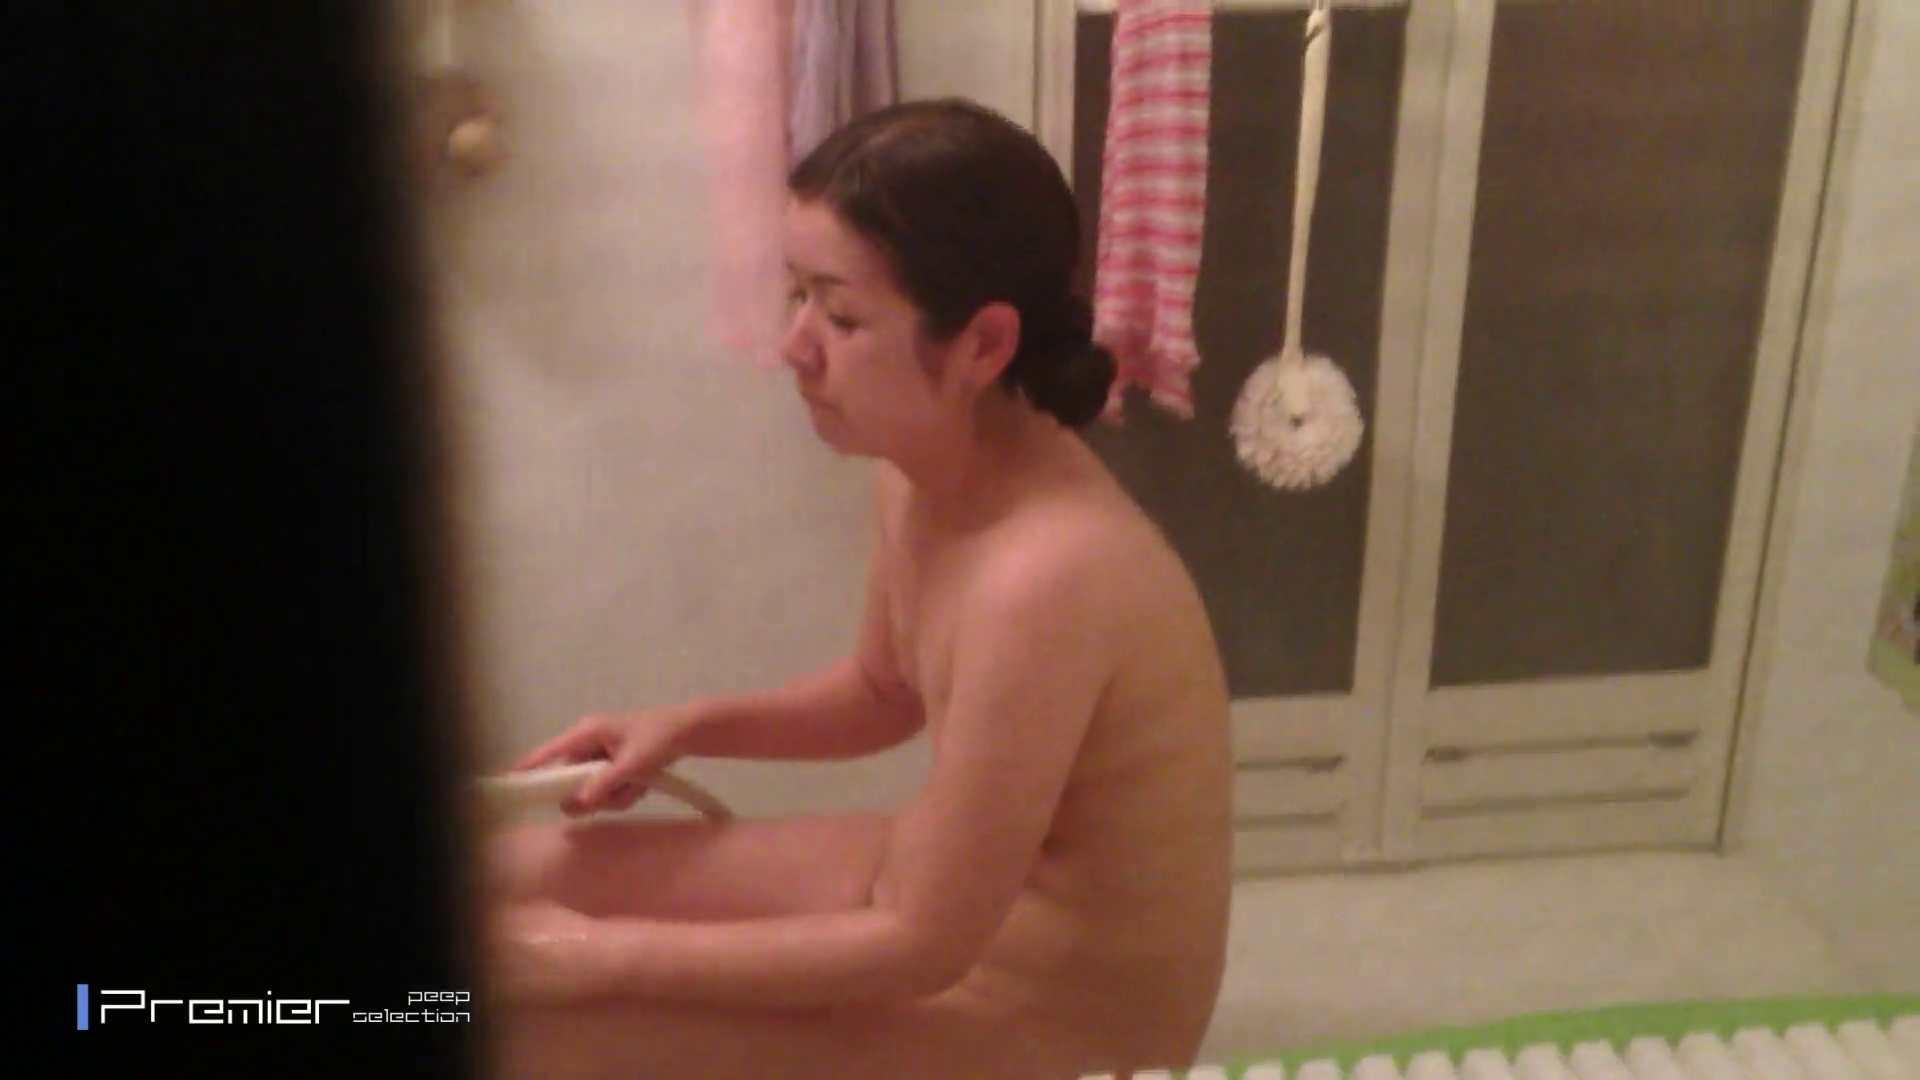 臨場感抜群!美人 OL の入浴シーン未公開版  美女達の私生活に潜入! 高画質  102Pix 22